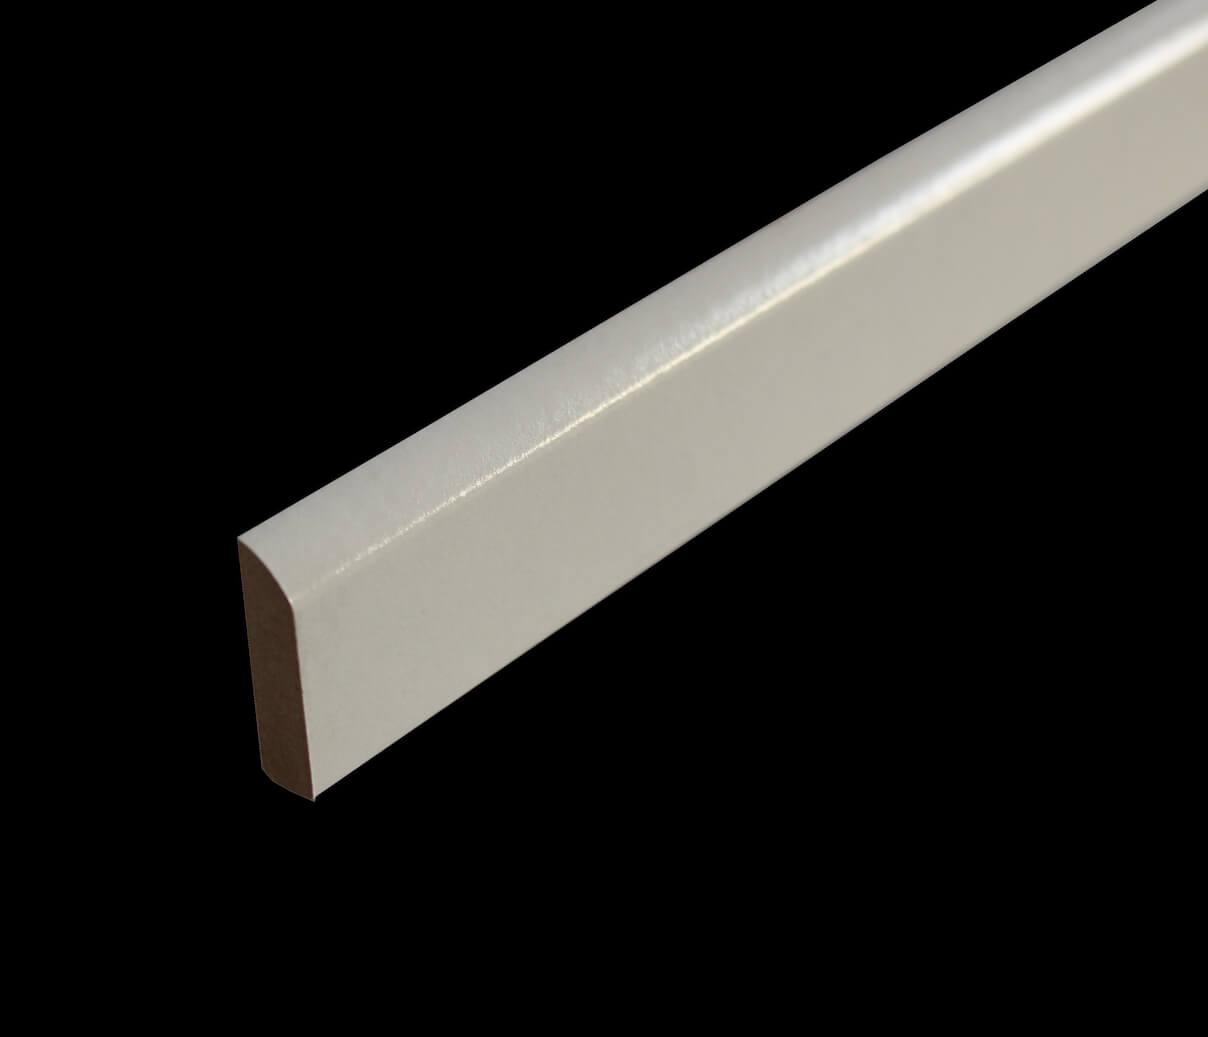 Plinthe Médium Mdf Revêtue Blanc 10 X 35 Mm Bord Arrondi